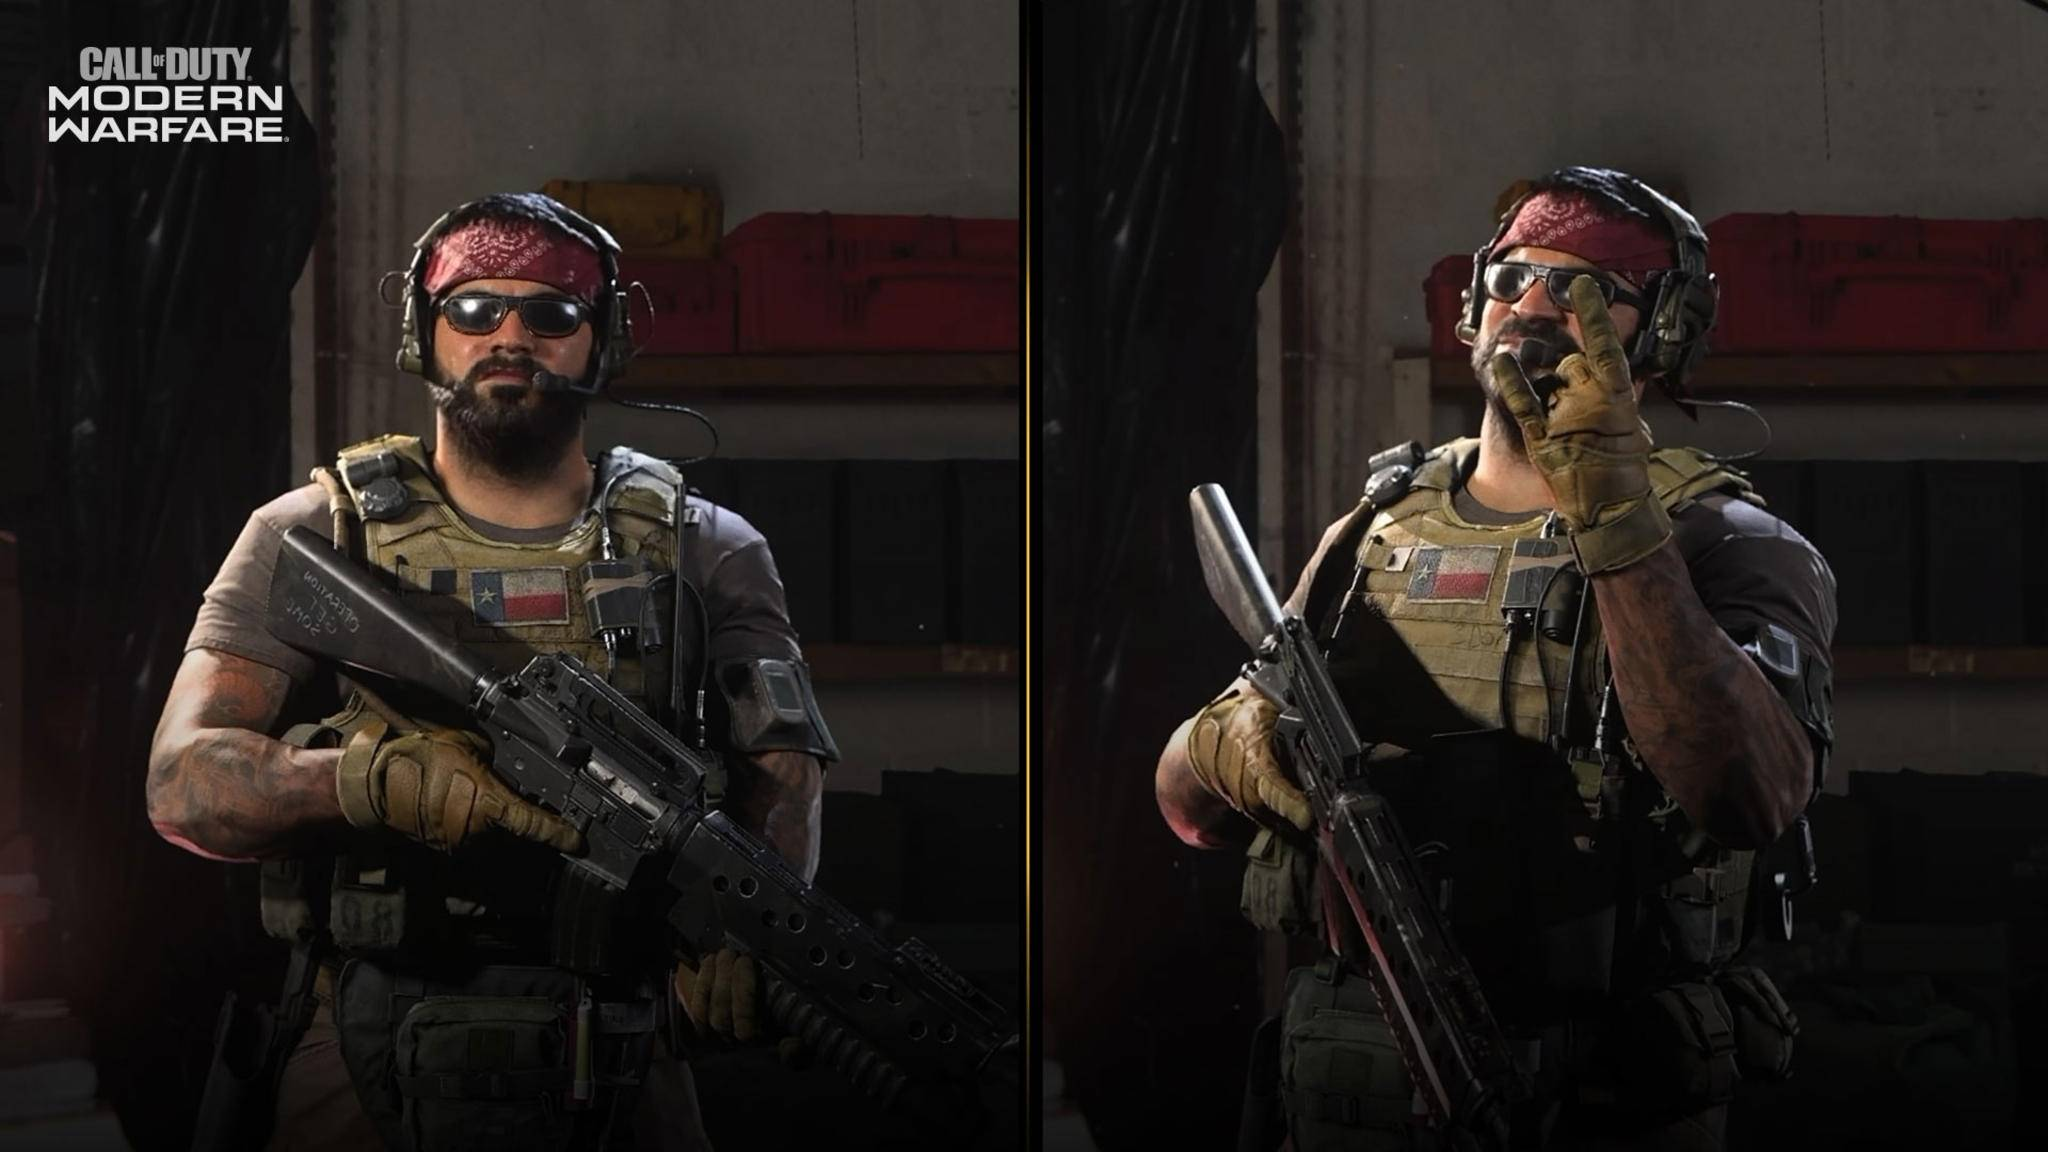 call-of-duty-modern-warfare-operator